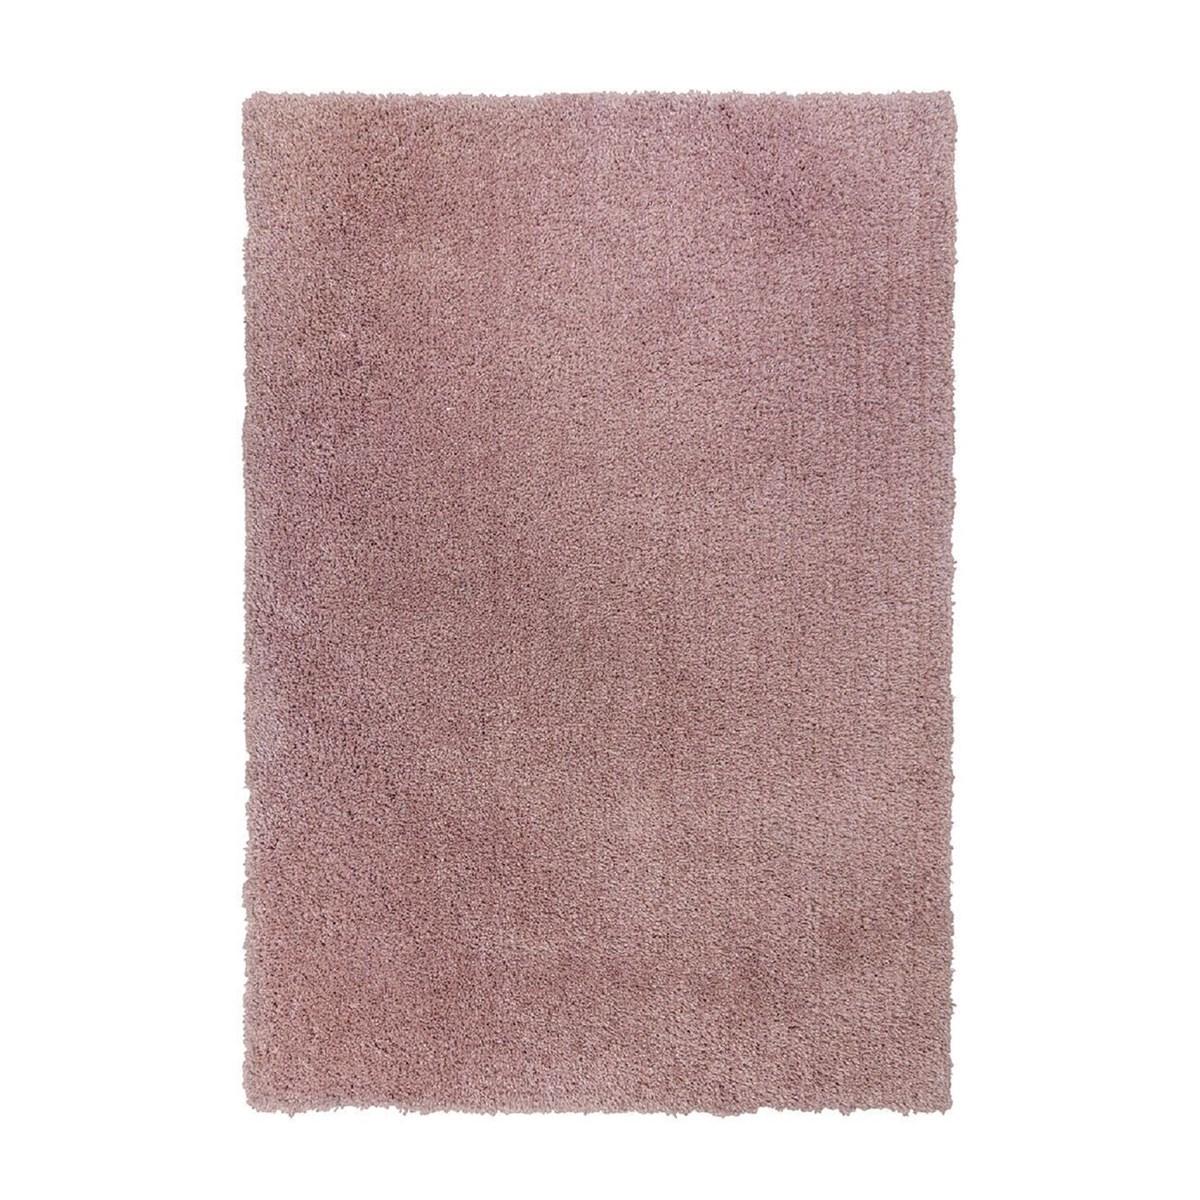 Tapis shaggy en Polyester Rose 80x160 cm